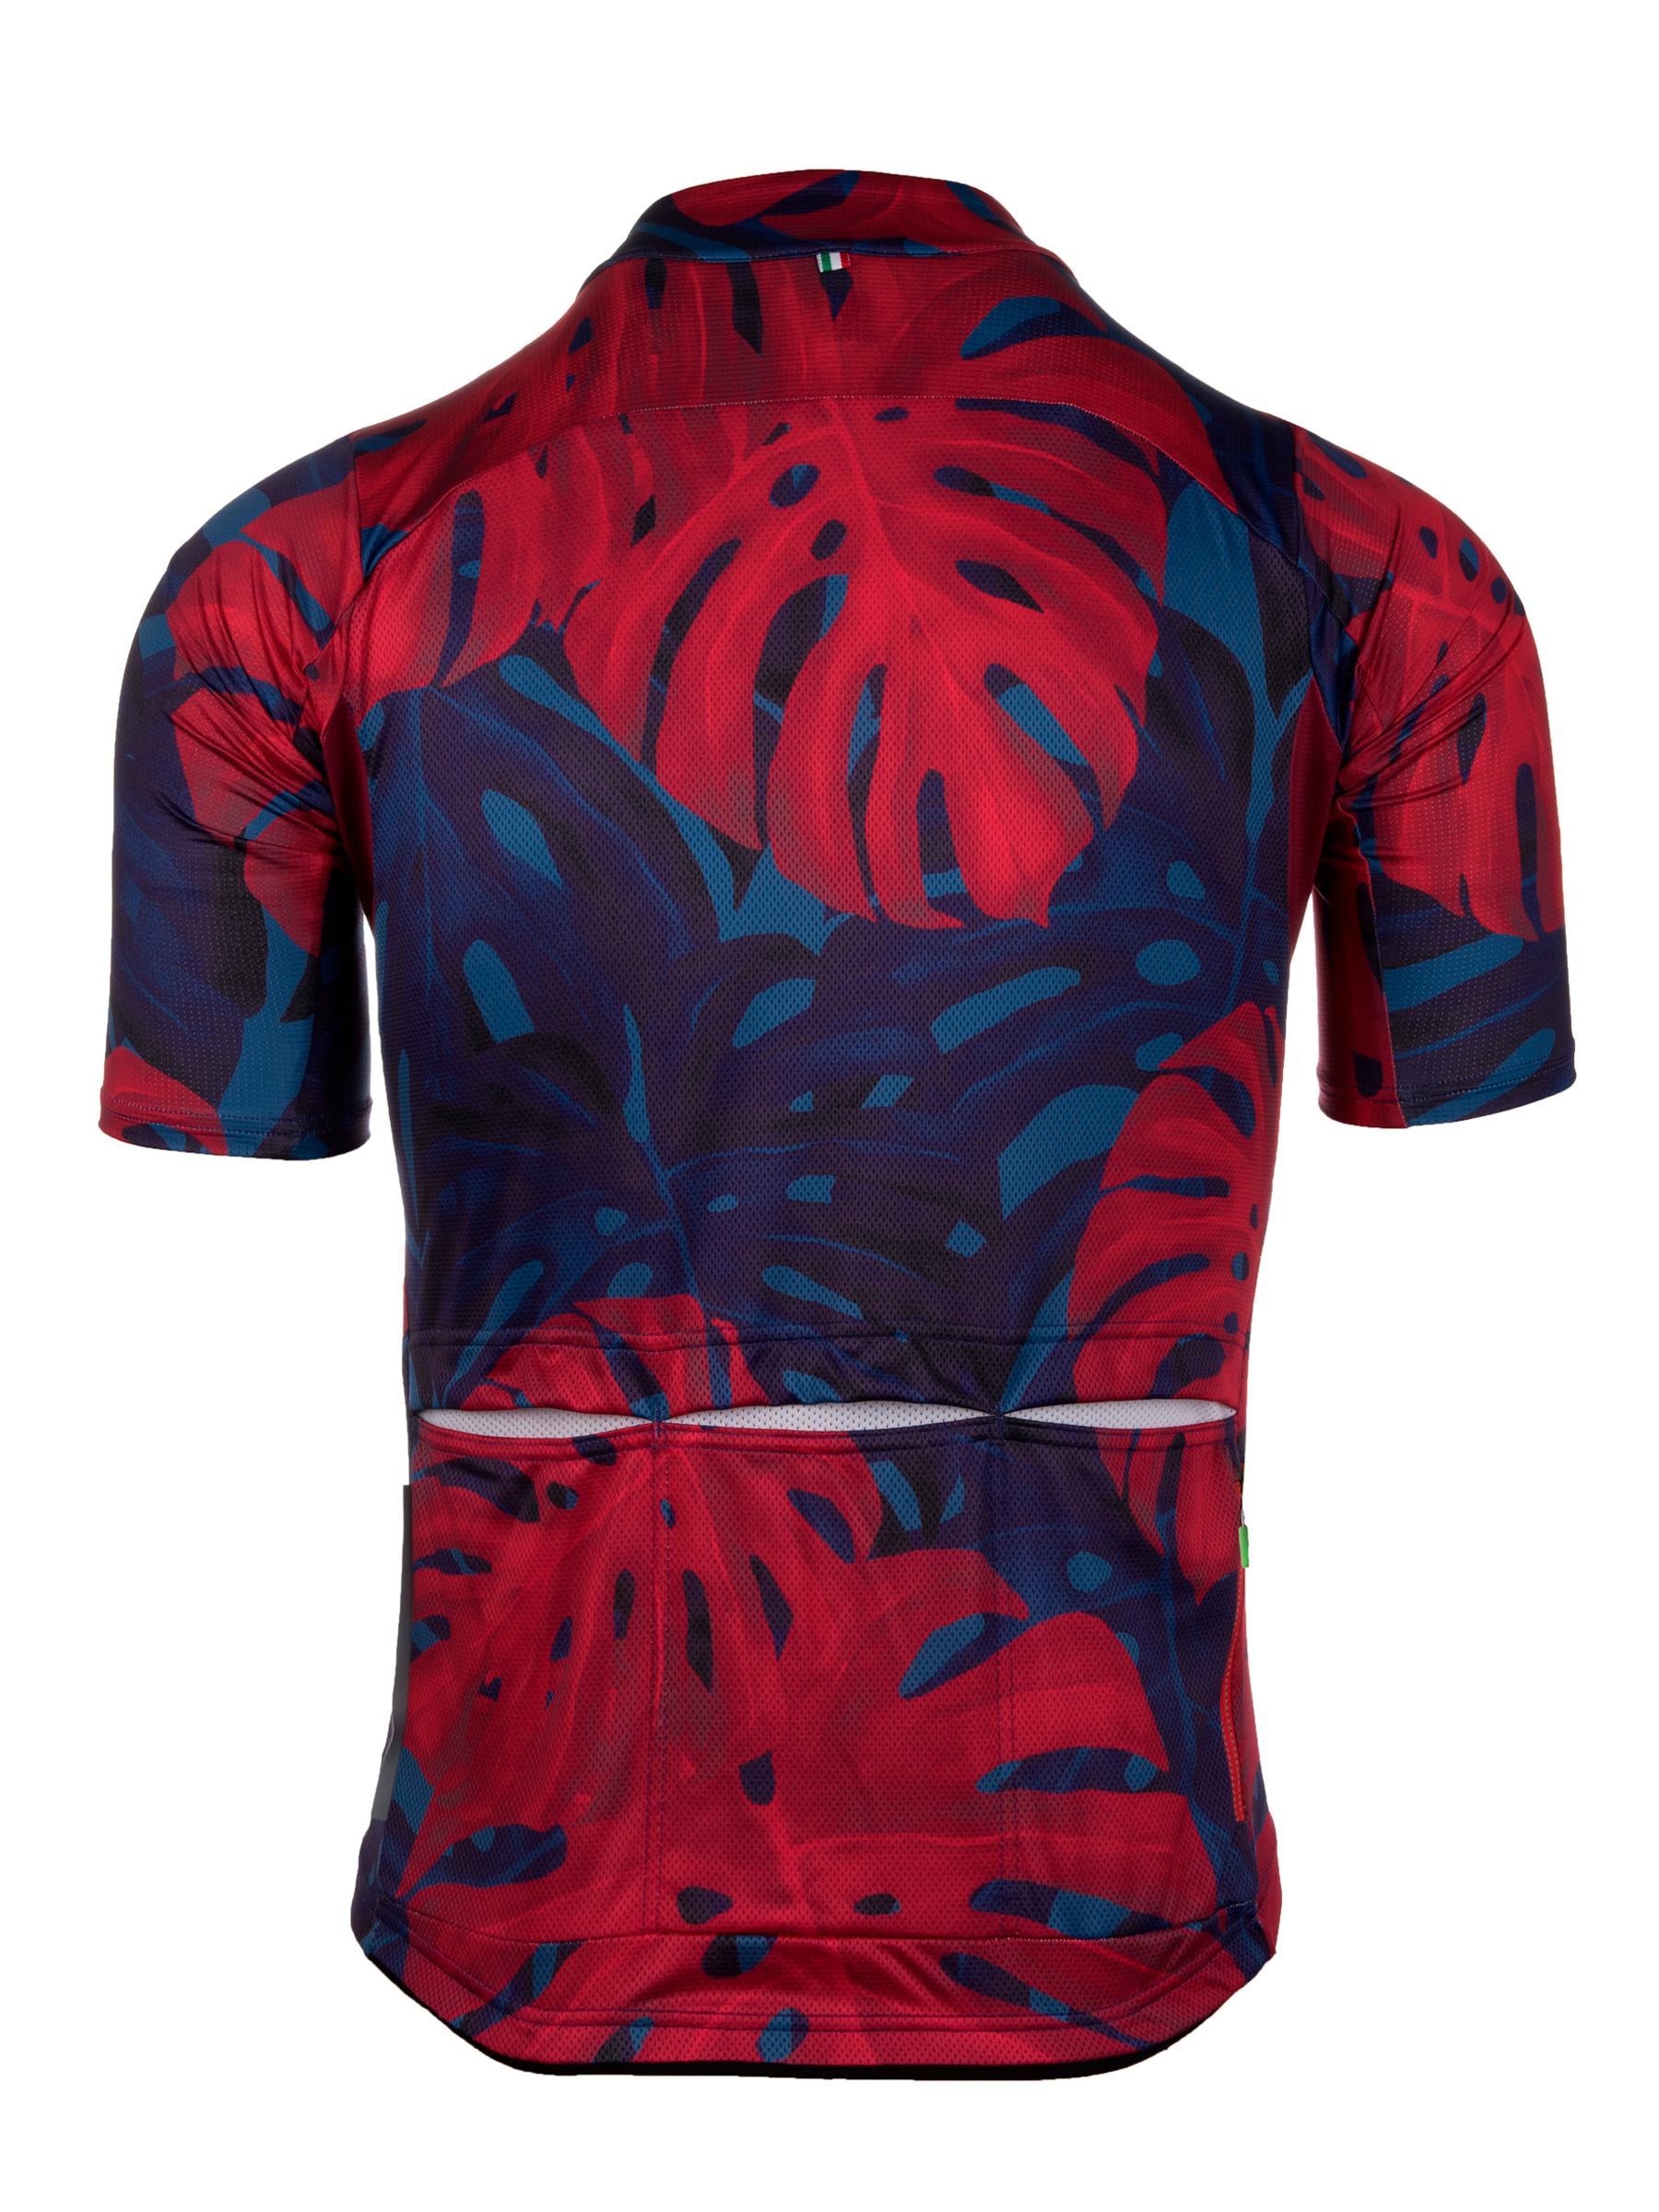 Jersey short sleeve G1 Panama